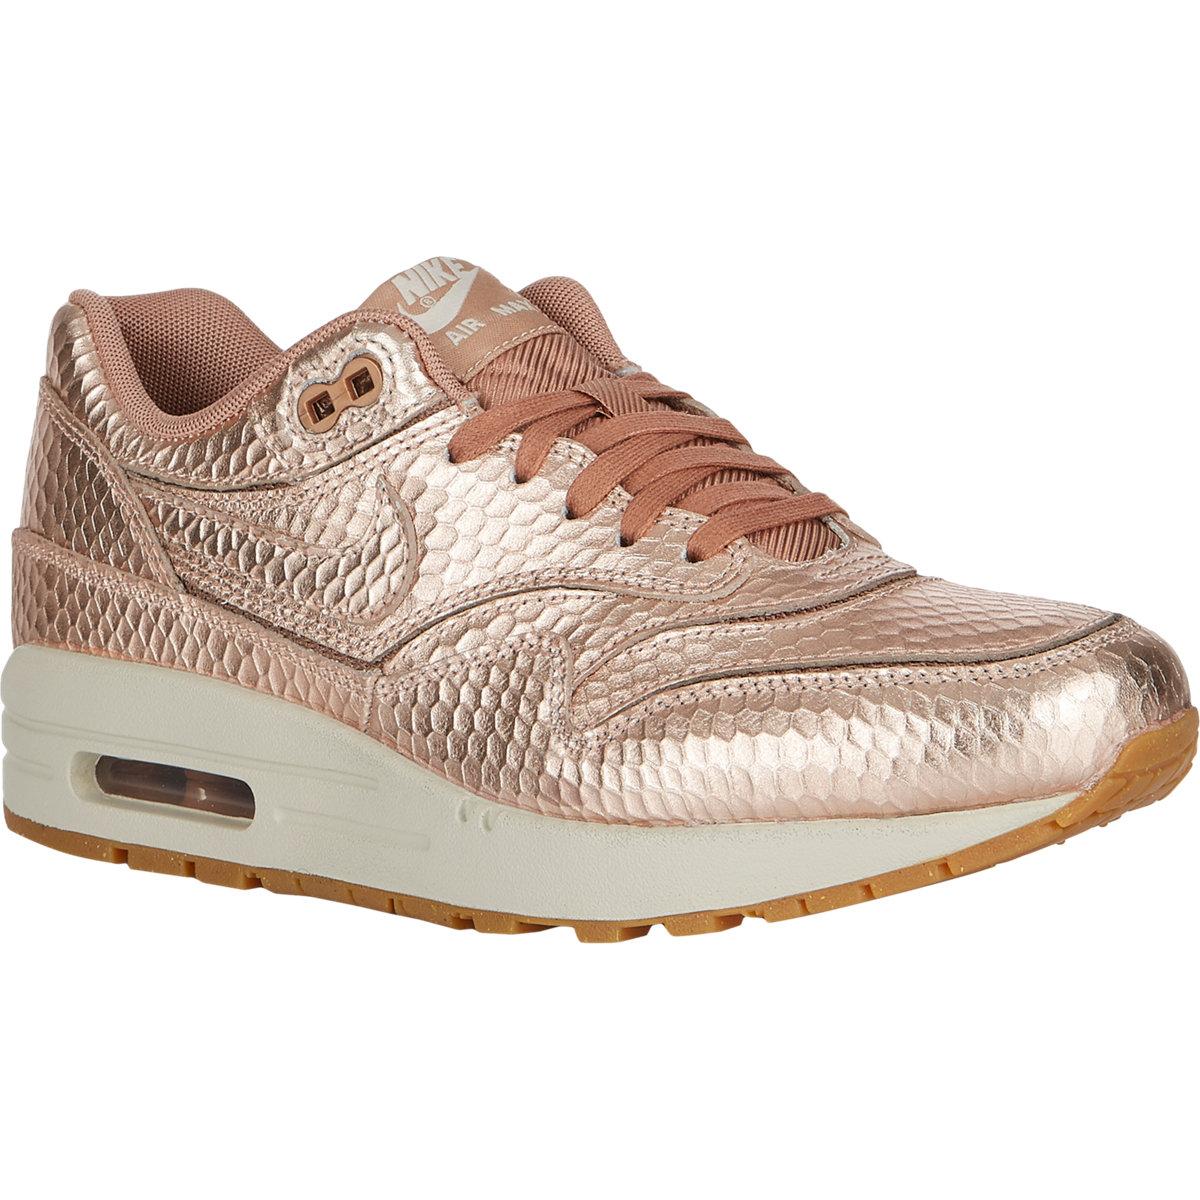 c79aa4a96617c Nike Air Max 1 Cutout Premium Sneakers in Metallic - Lyst